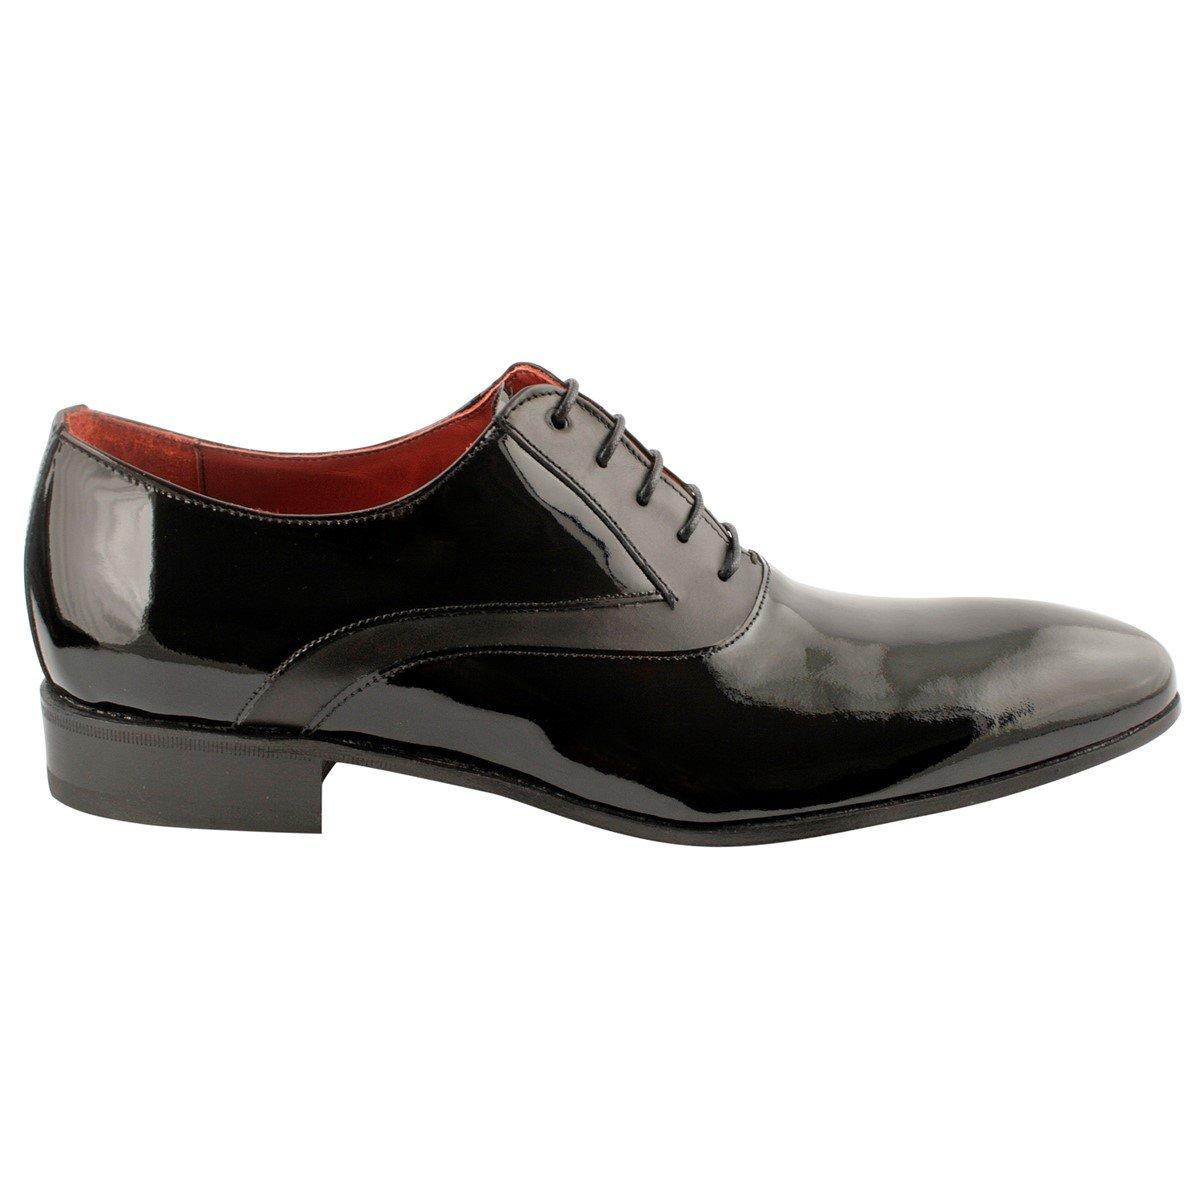 5527aa07fbb6 Exclusif Paris Richelieus Mickey  Amazon.fr  Chaussures et Sacs